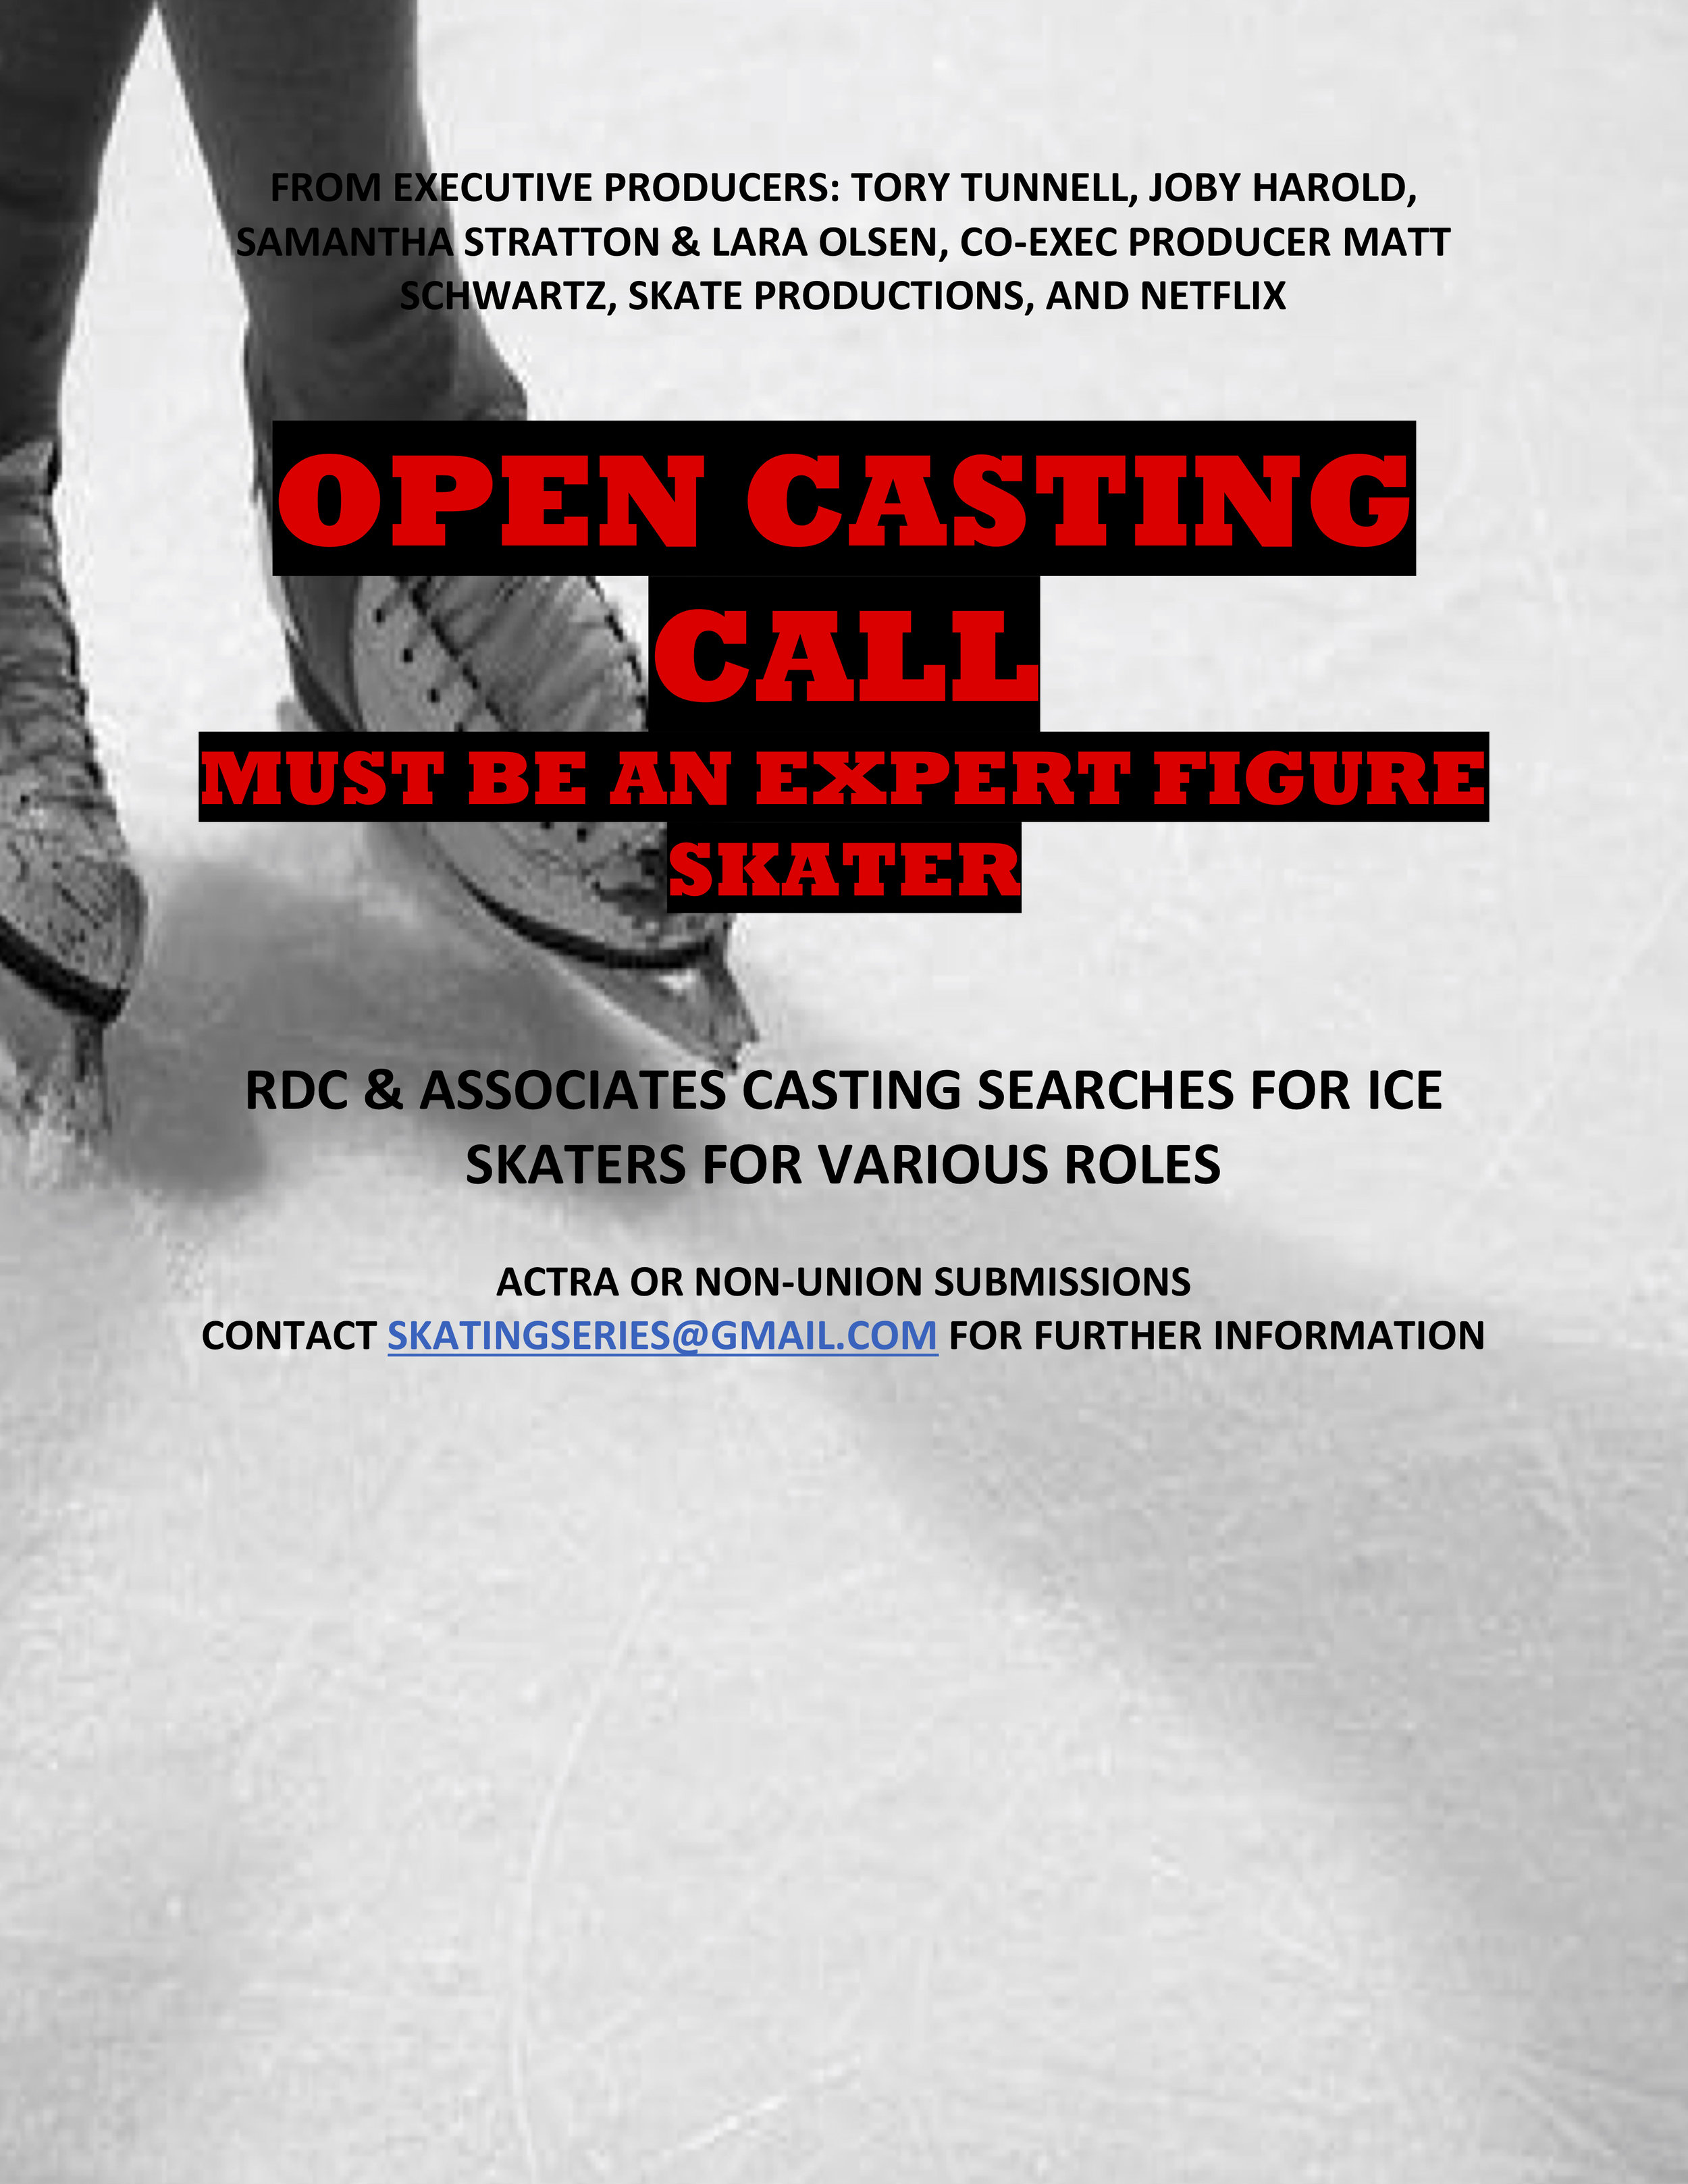 OPEN CASTING CALL RDC.jpg